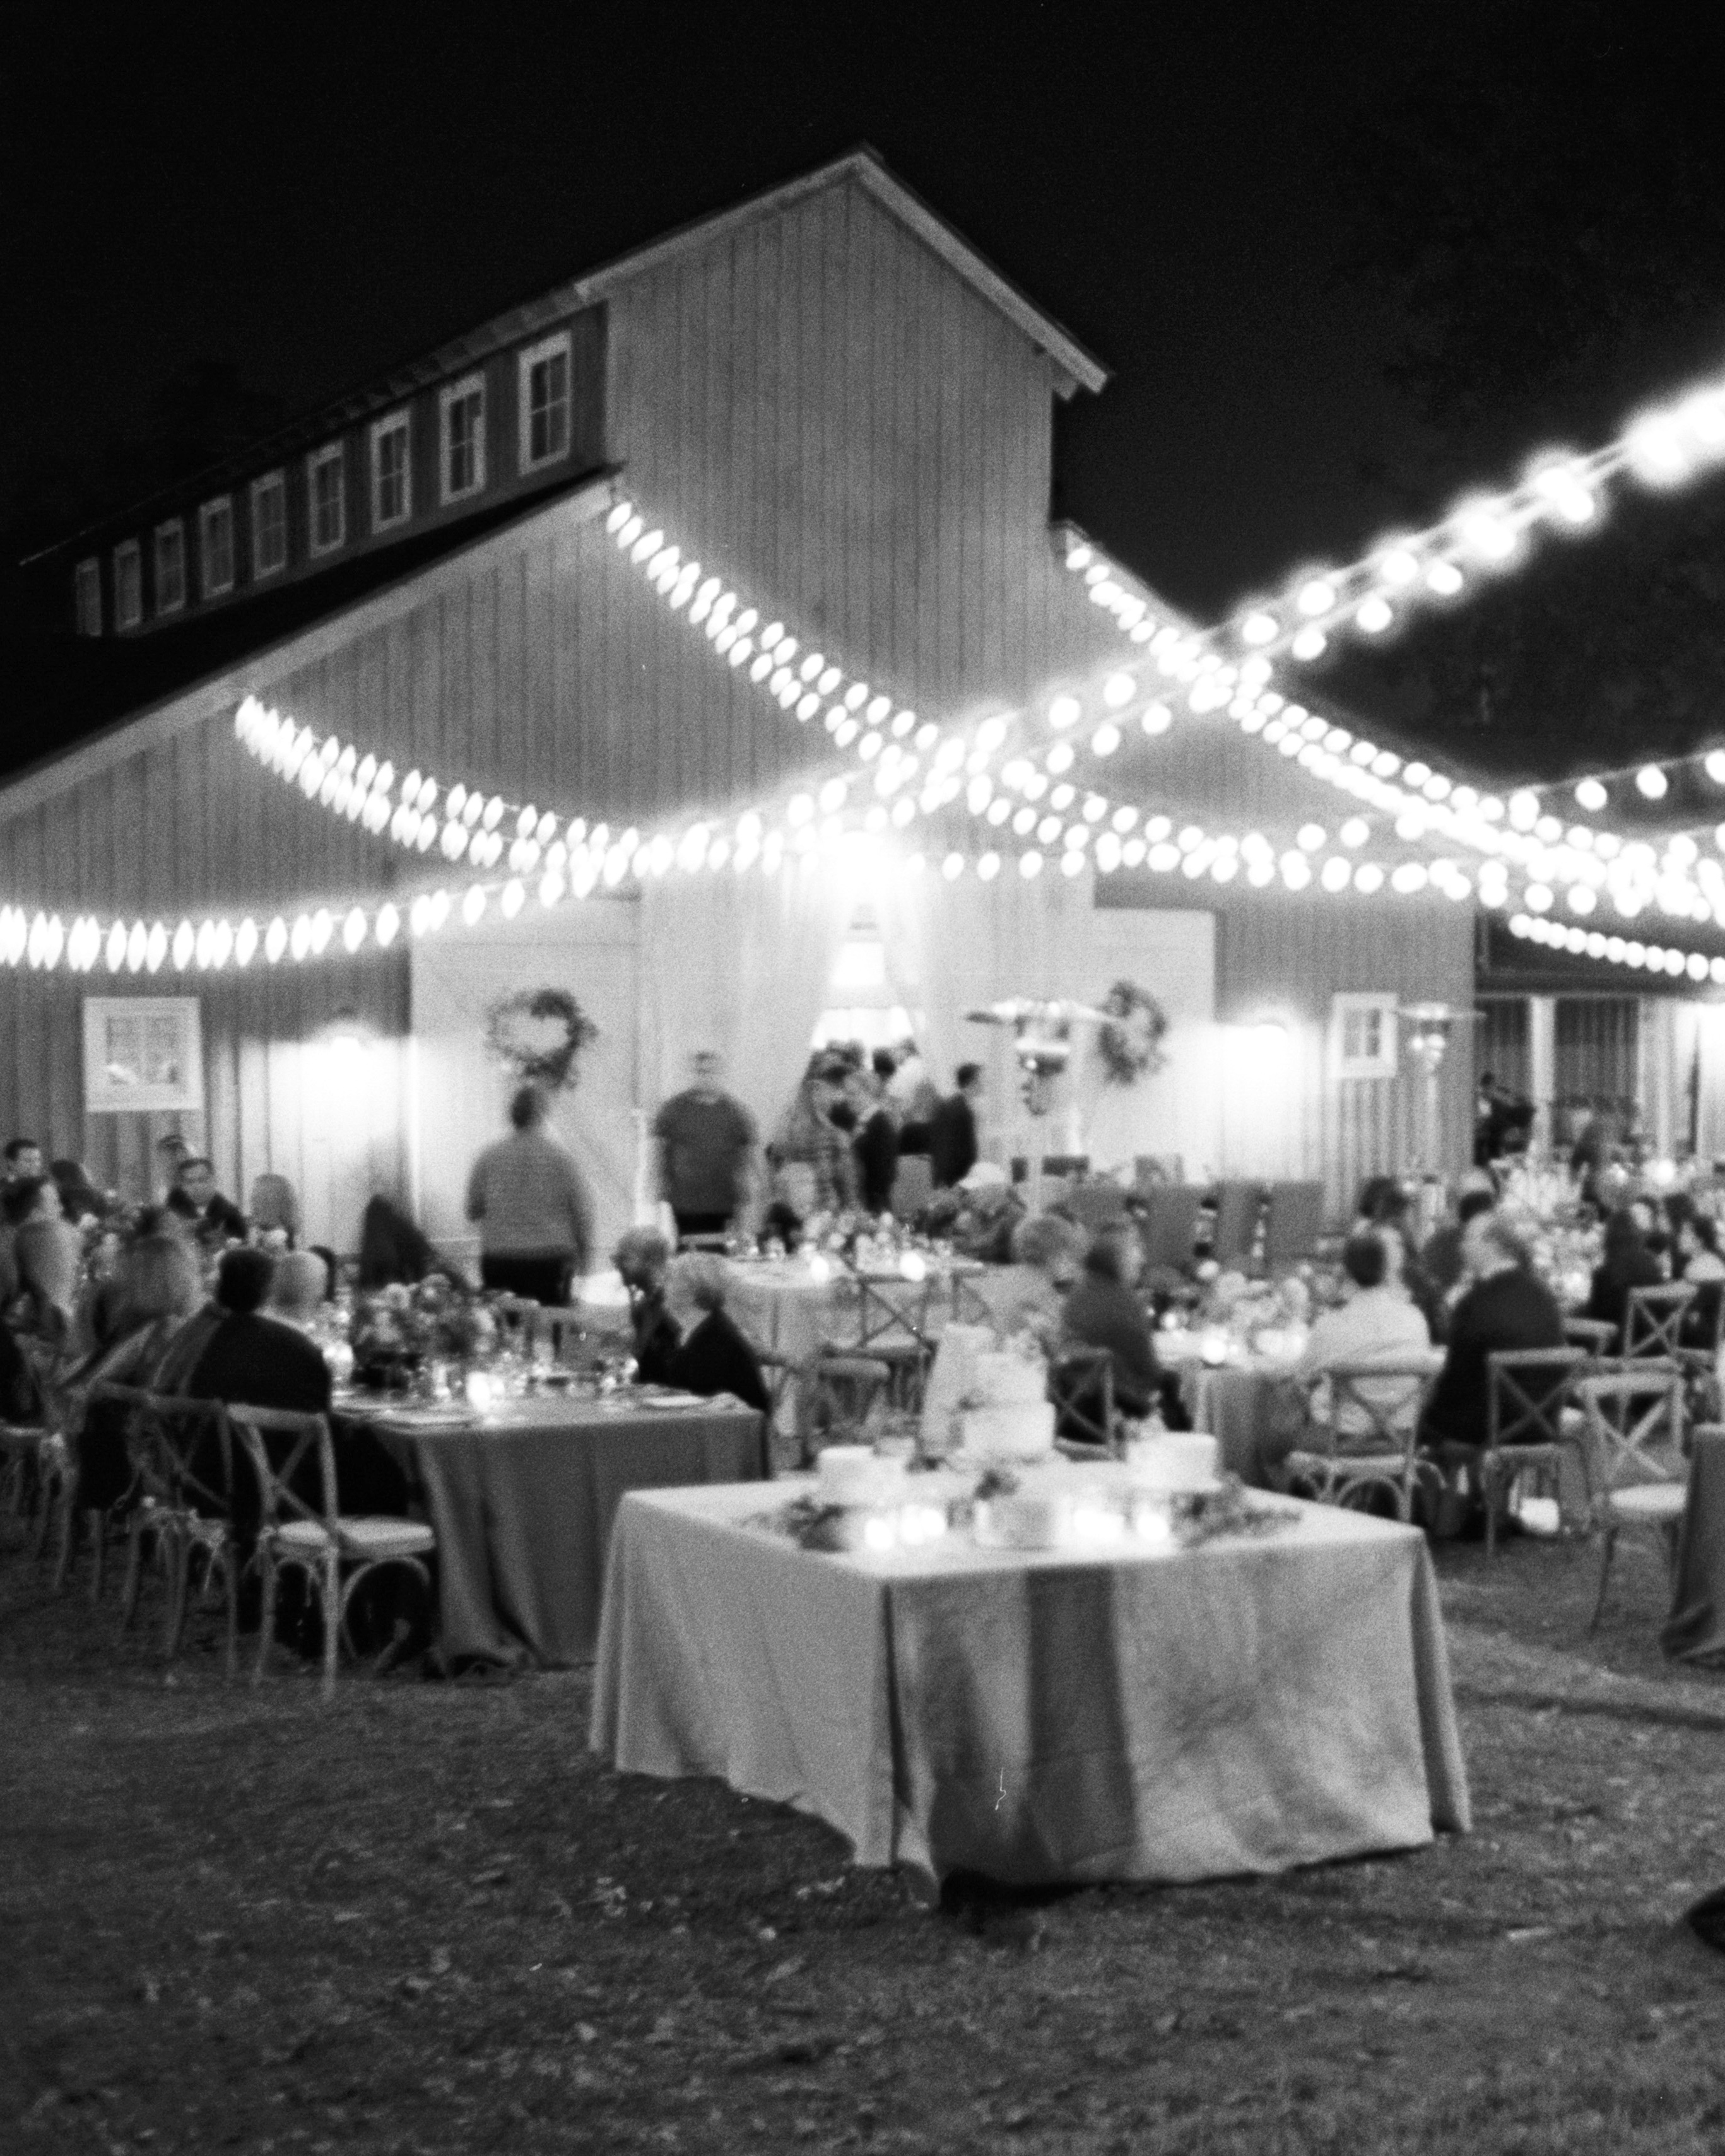 jayme barry wedding reception setting